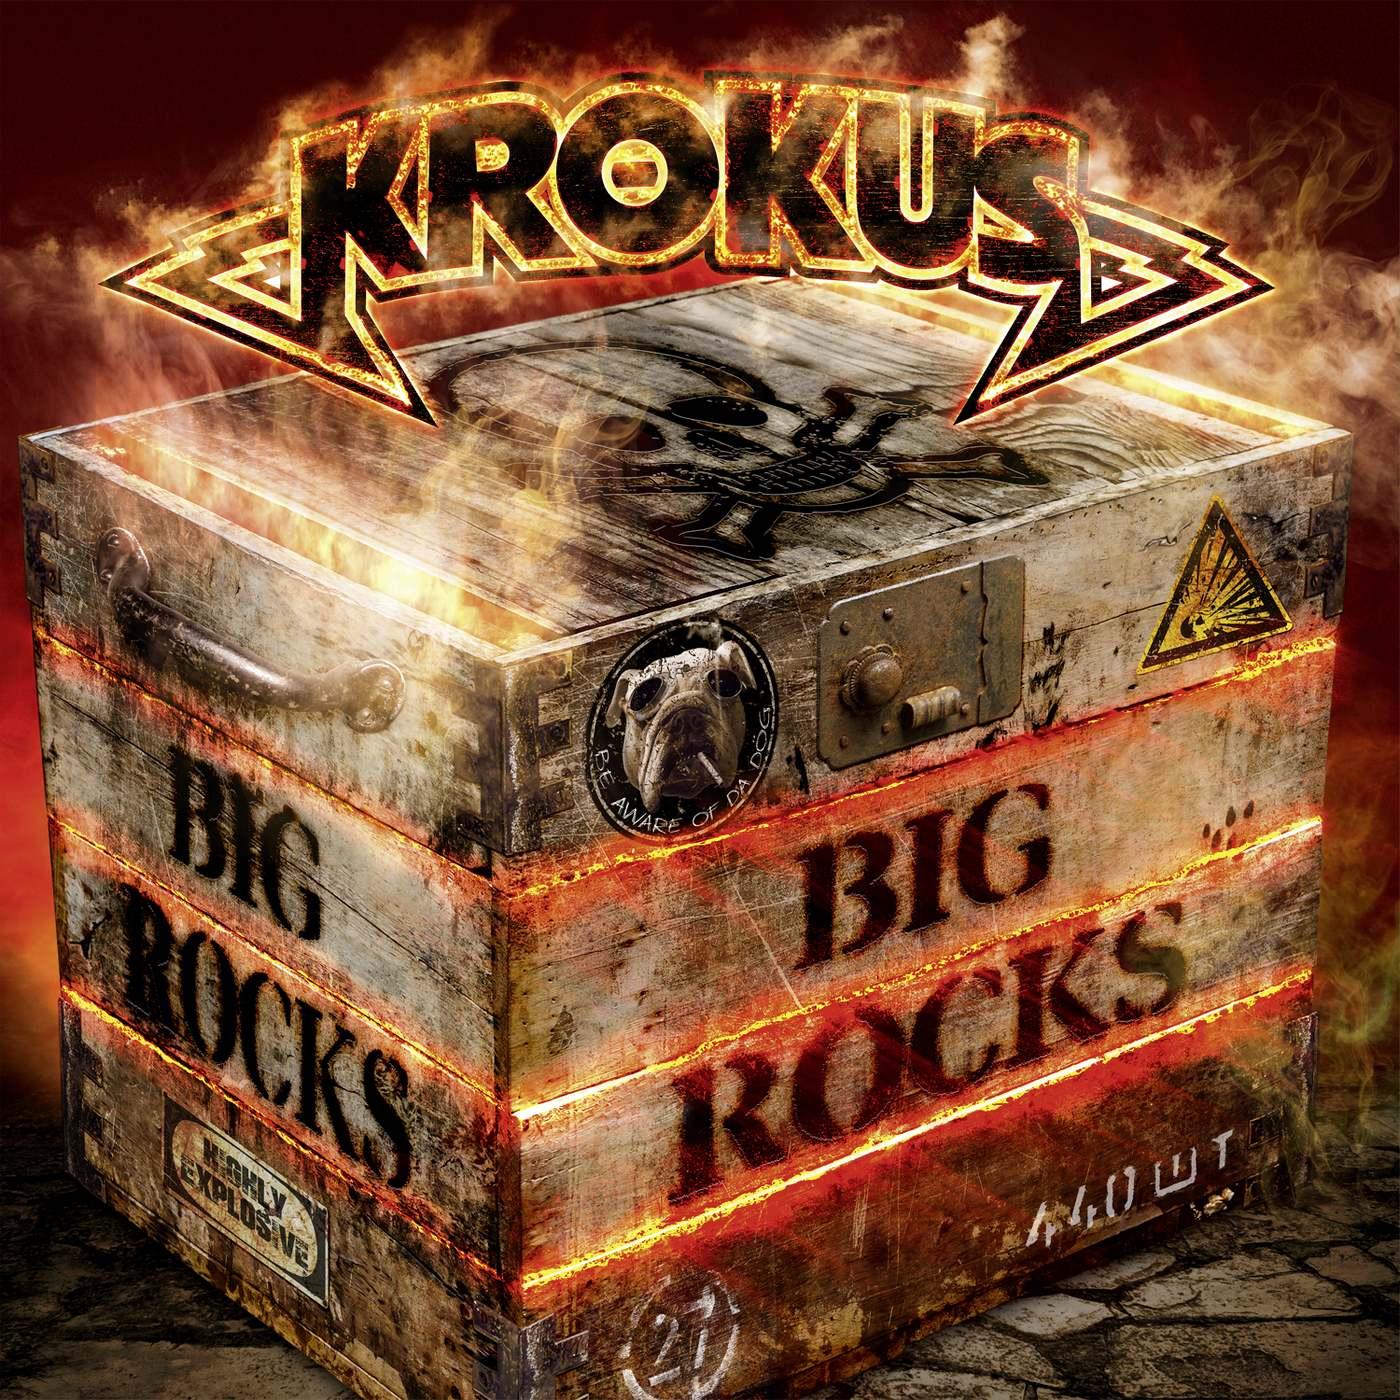 Krokus: Big Rocks (2017) Book Cover